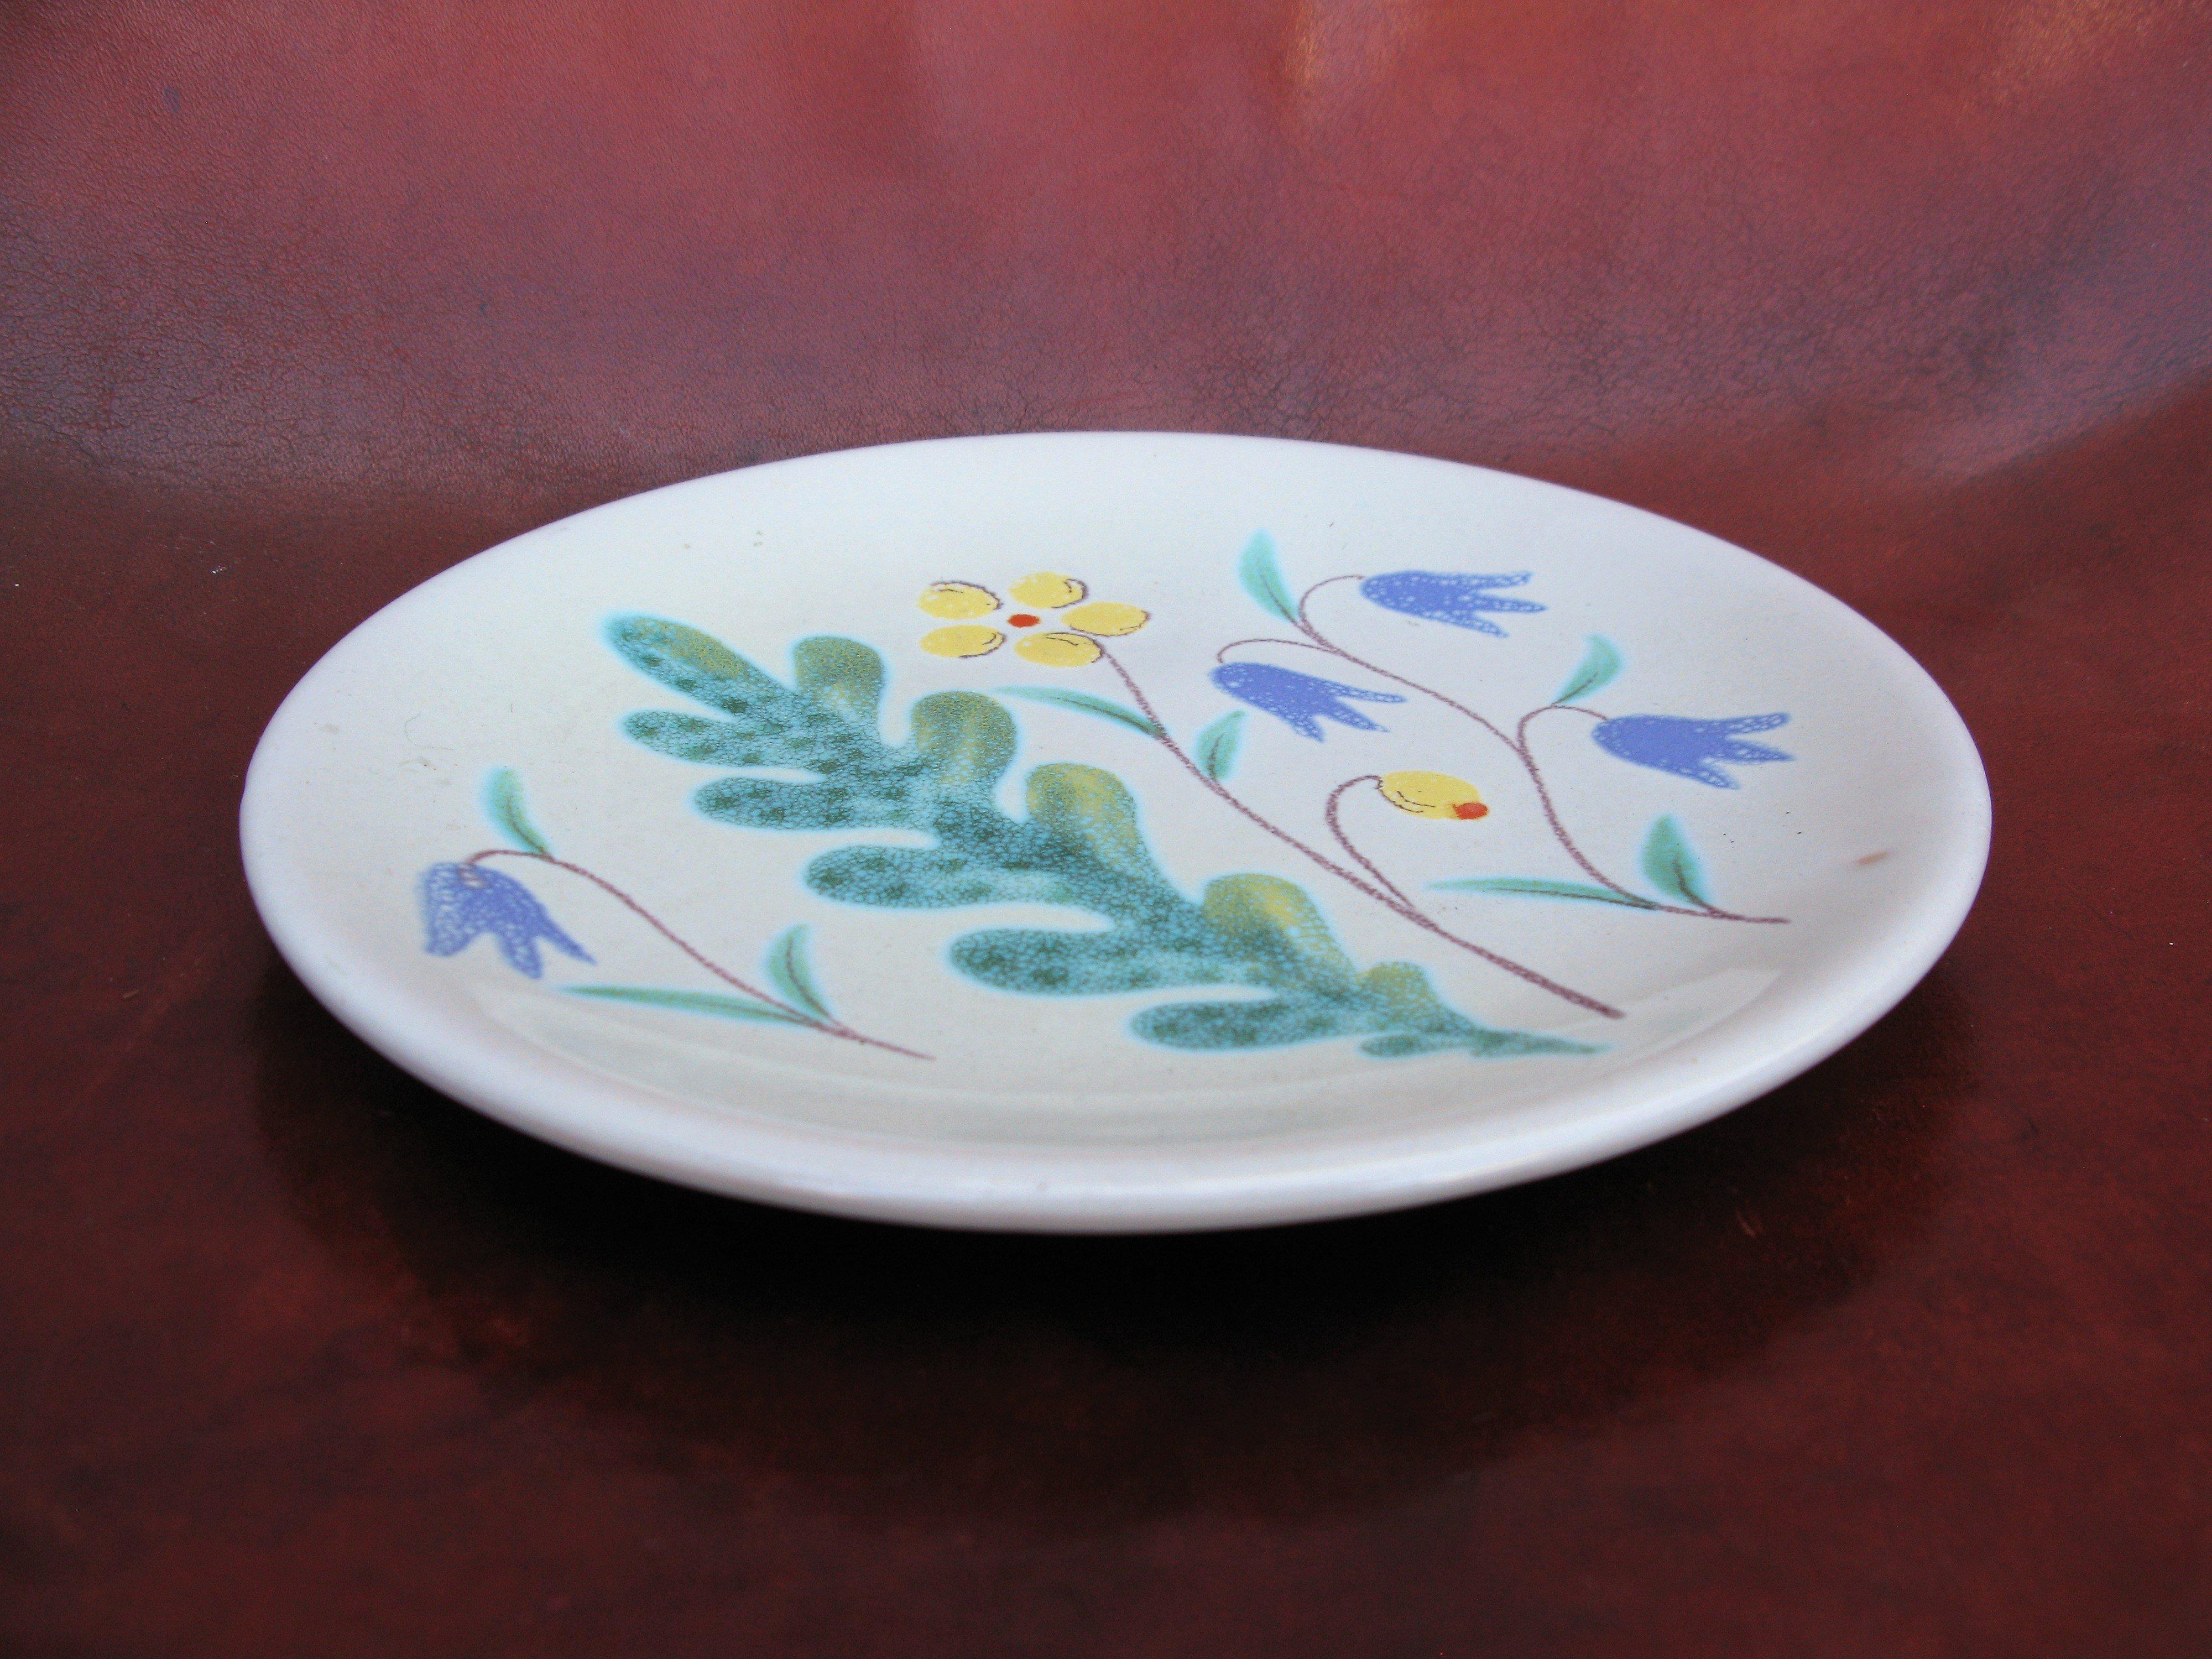 ängsblom small plate 1